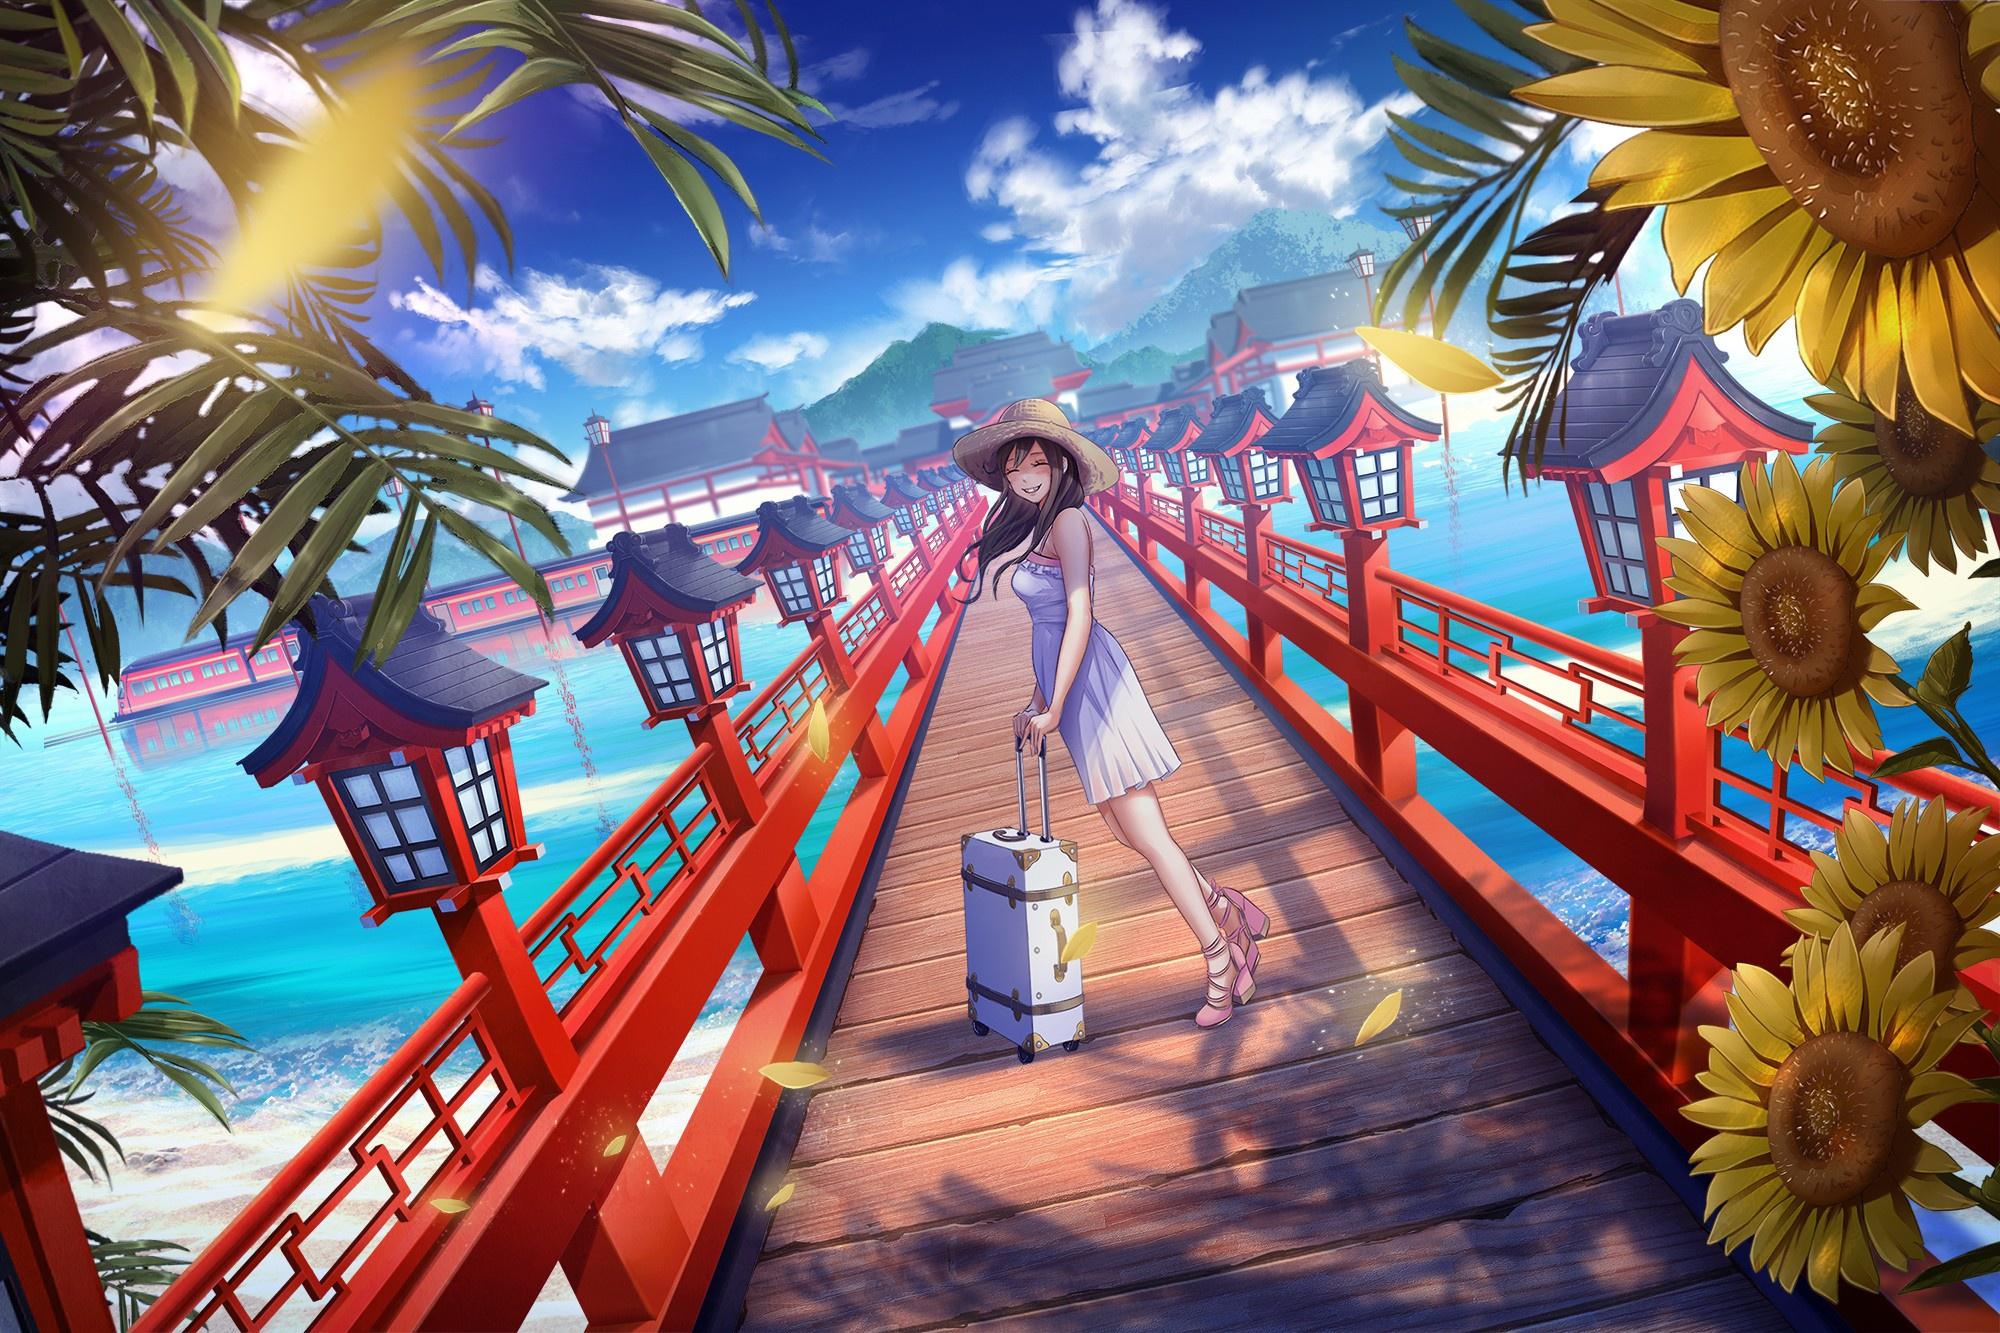 anime-art-devushka-podsolnukhi-more-voda-oblaka-plate-tsvety